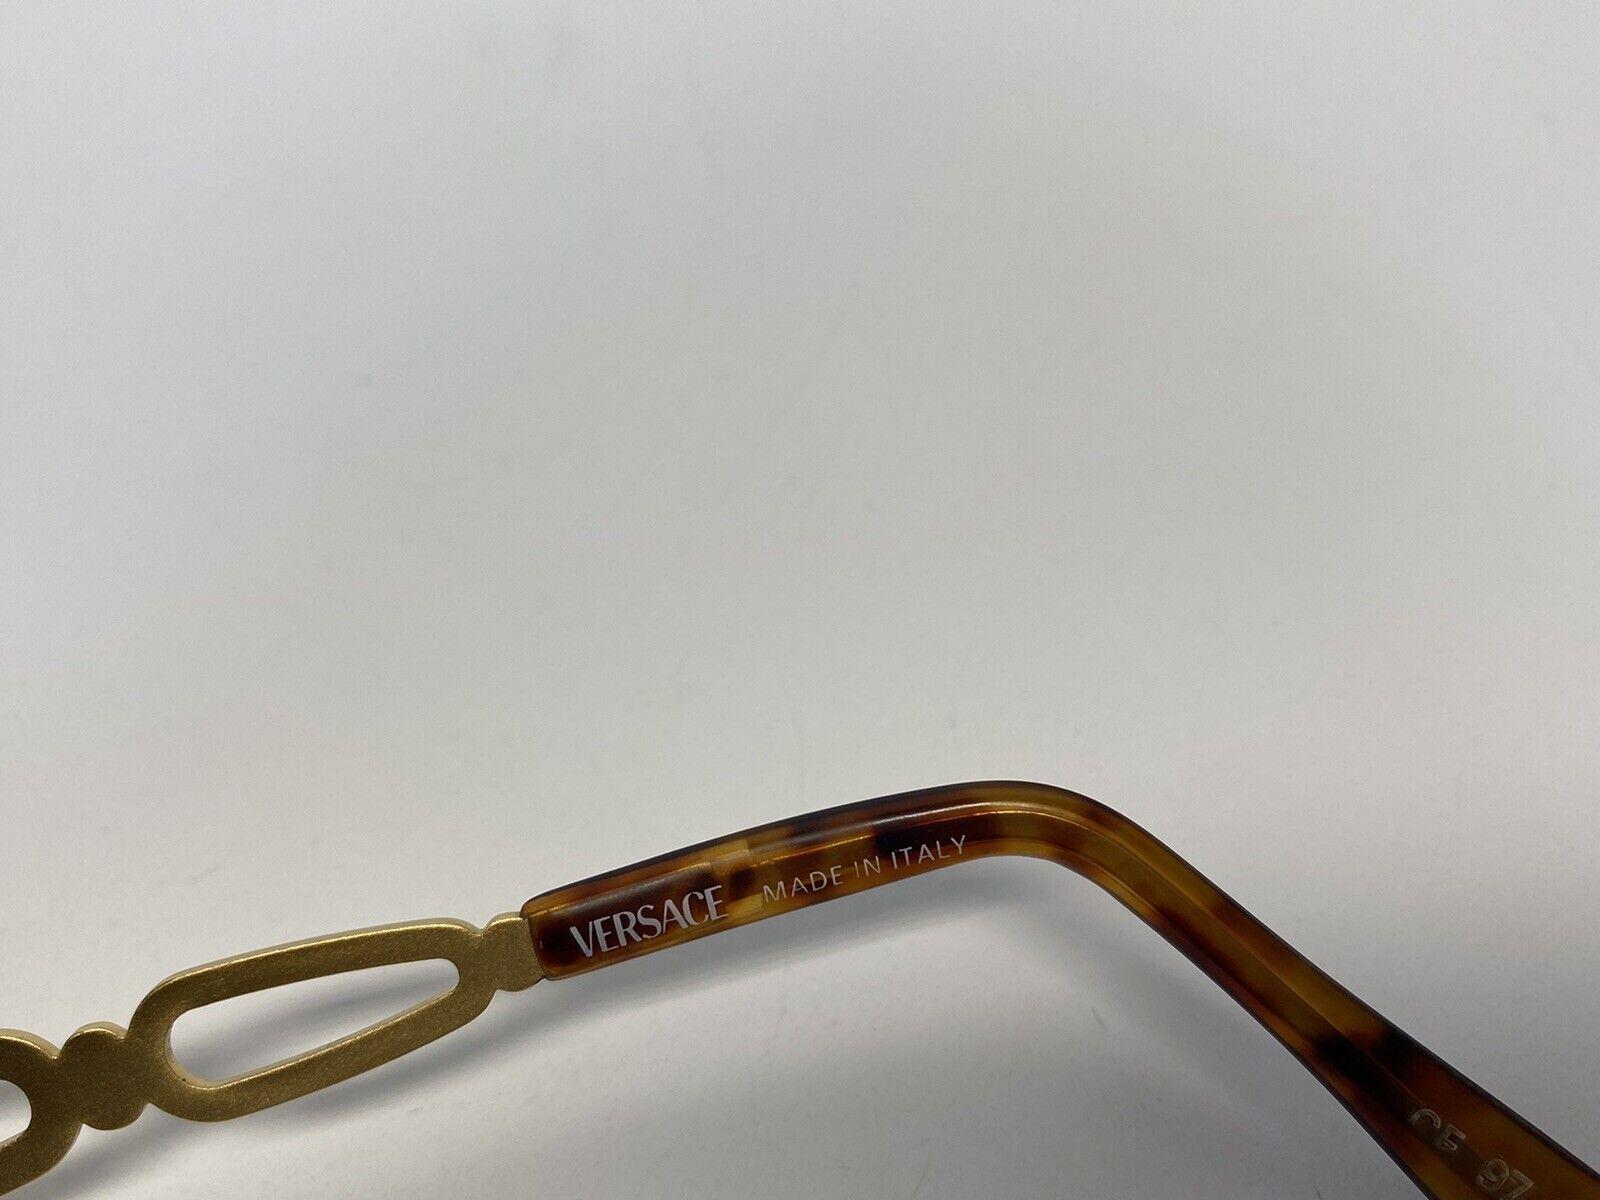 Rare Vtg Gianni Versace Brown Gold Medusa Sunglas… - image 6